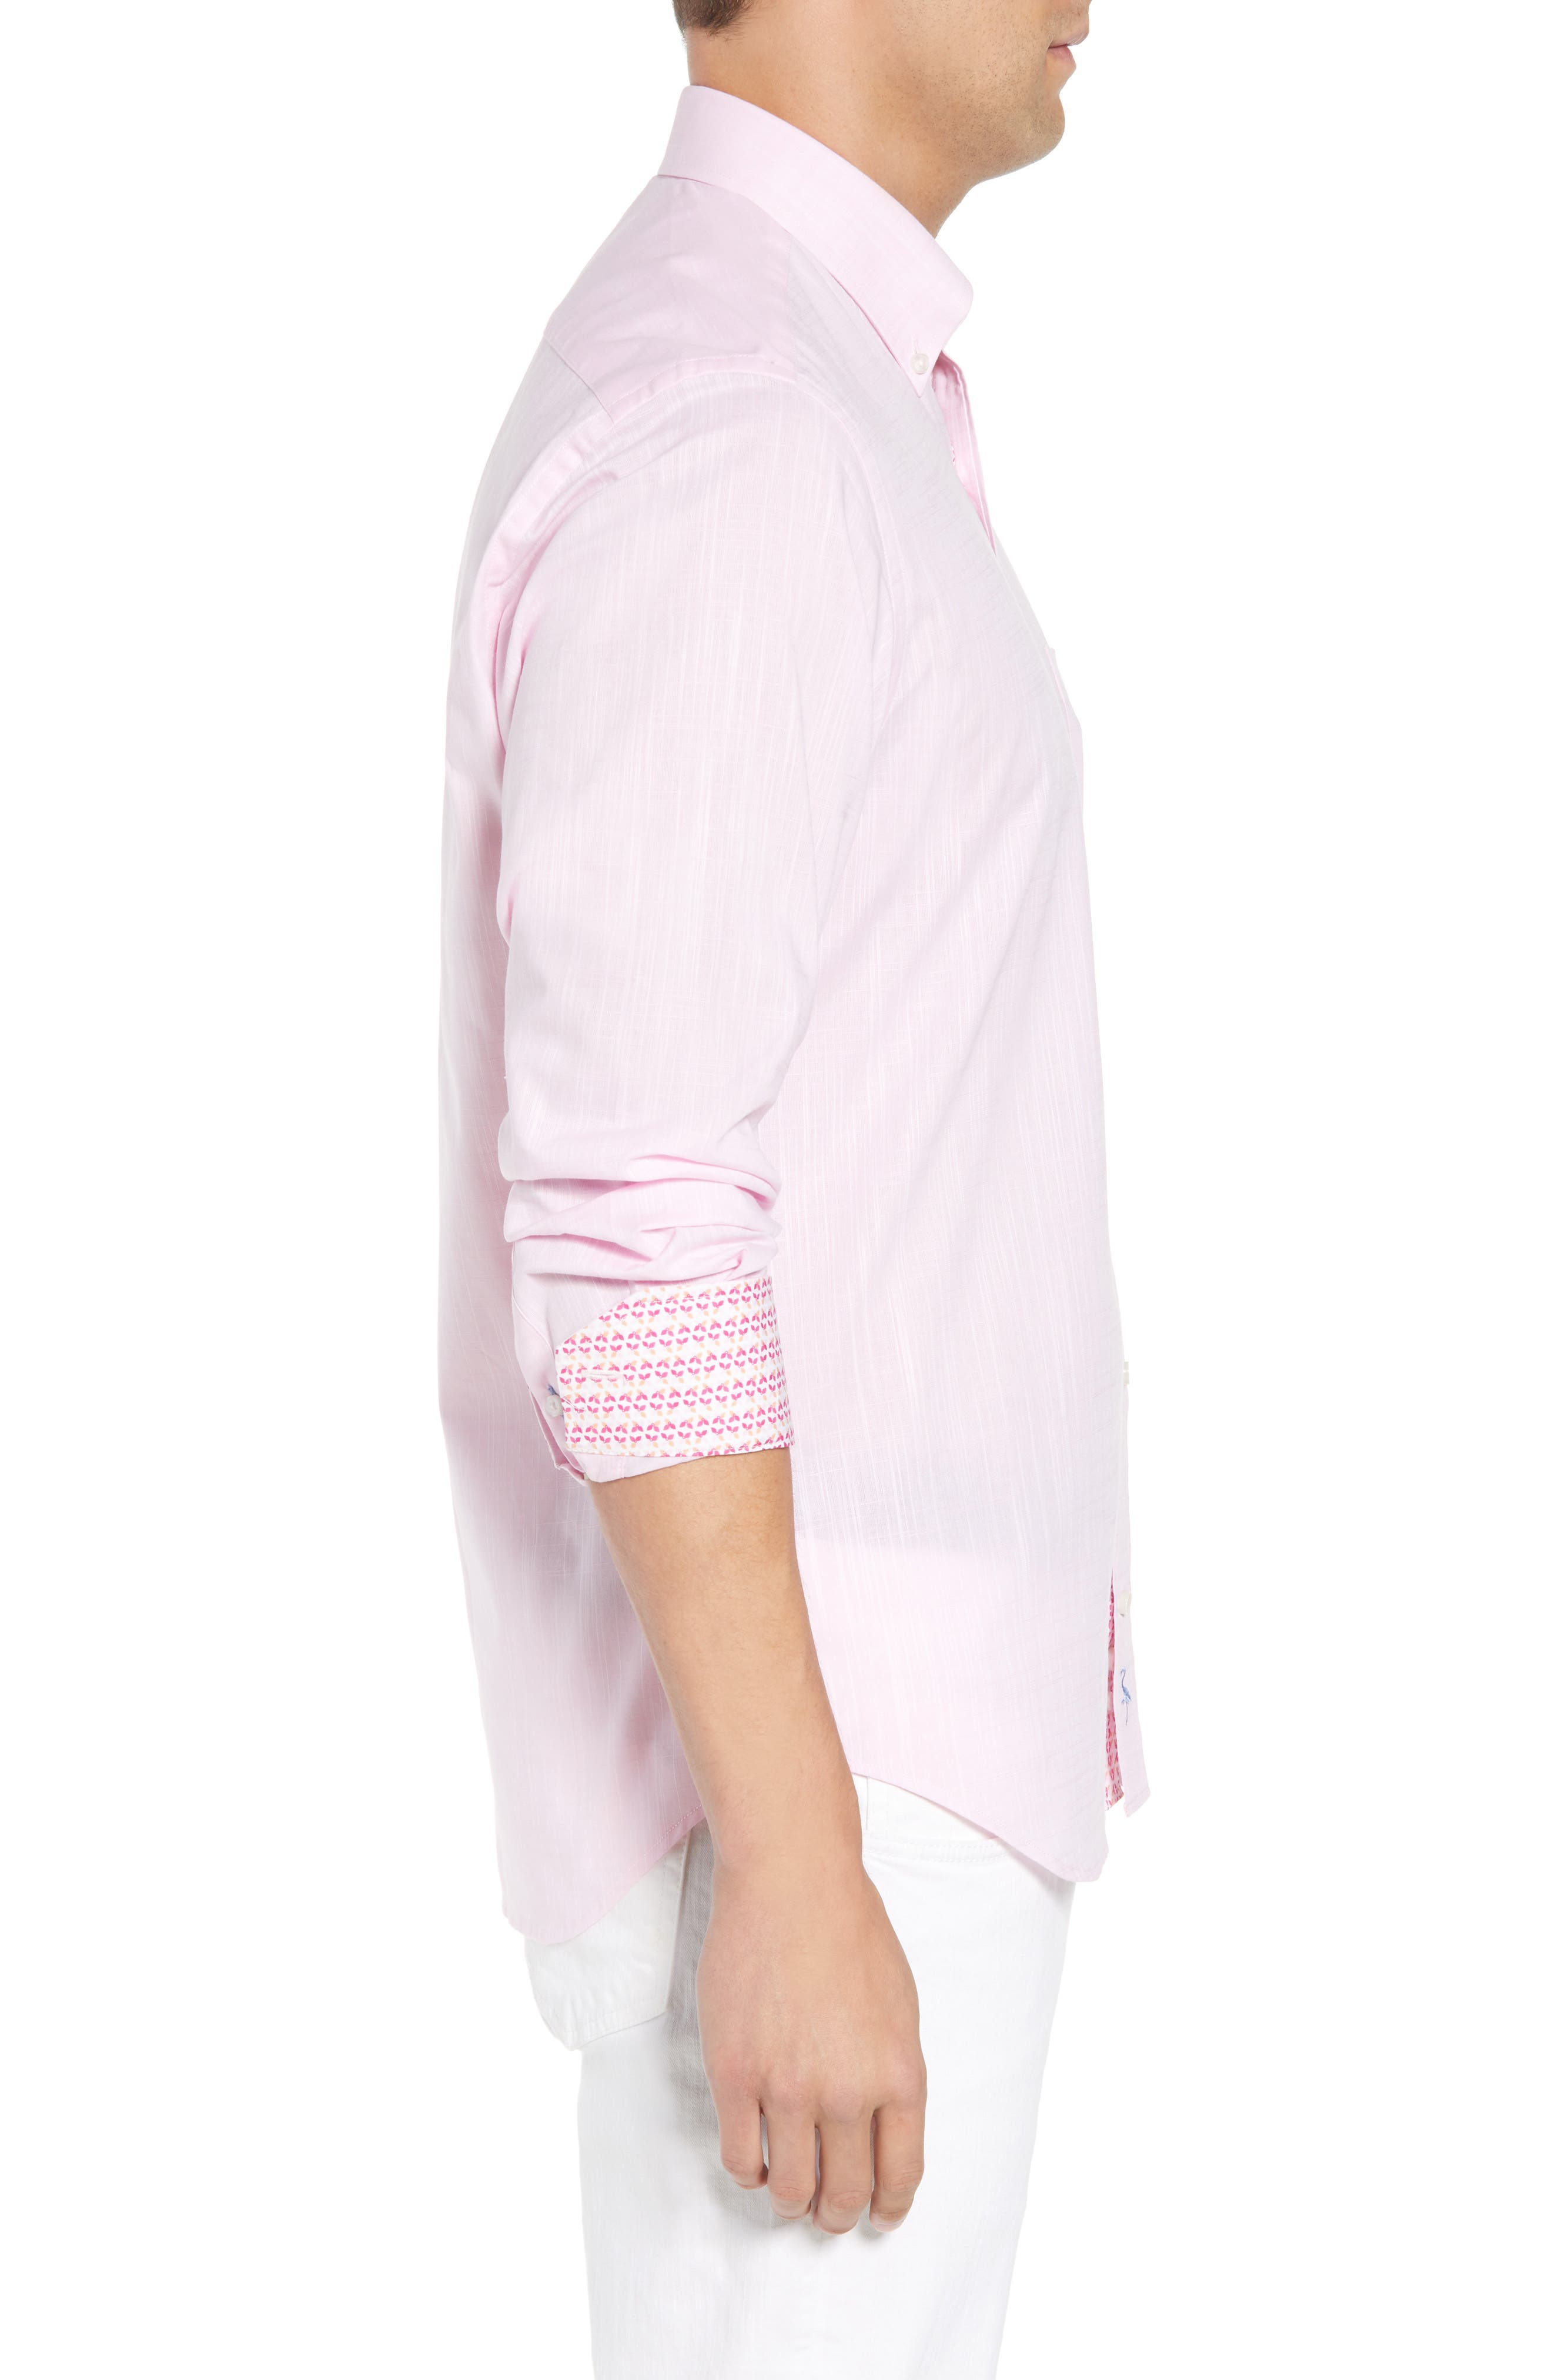 Kade Regular Fit Sport Shirt,                             Alternate thumbnail 4, color,                             Pink